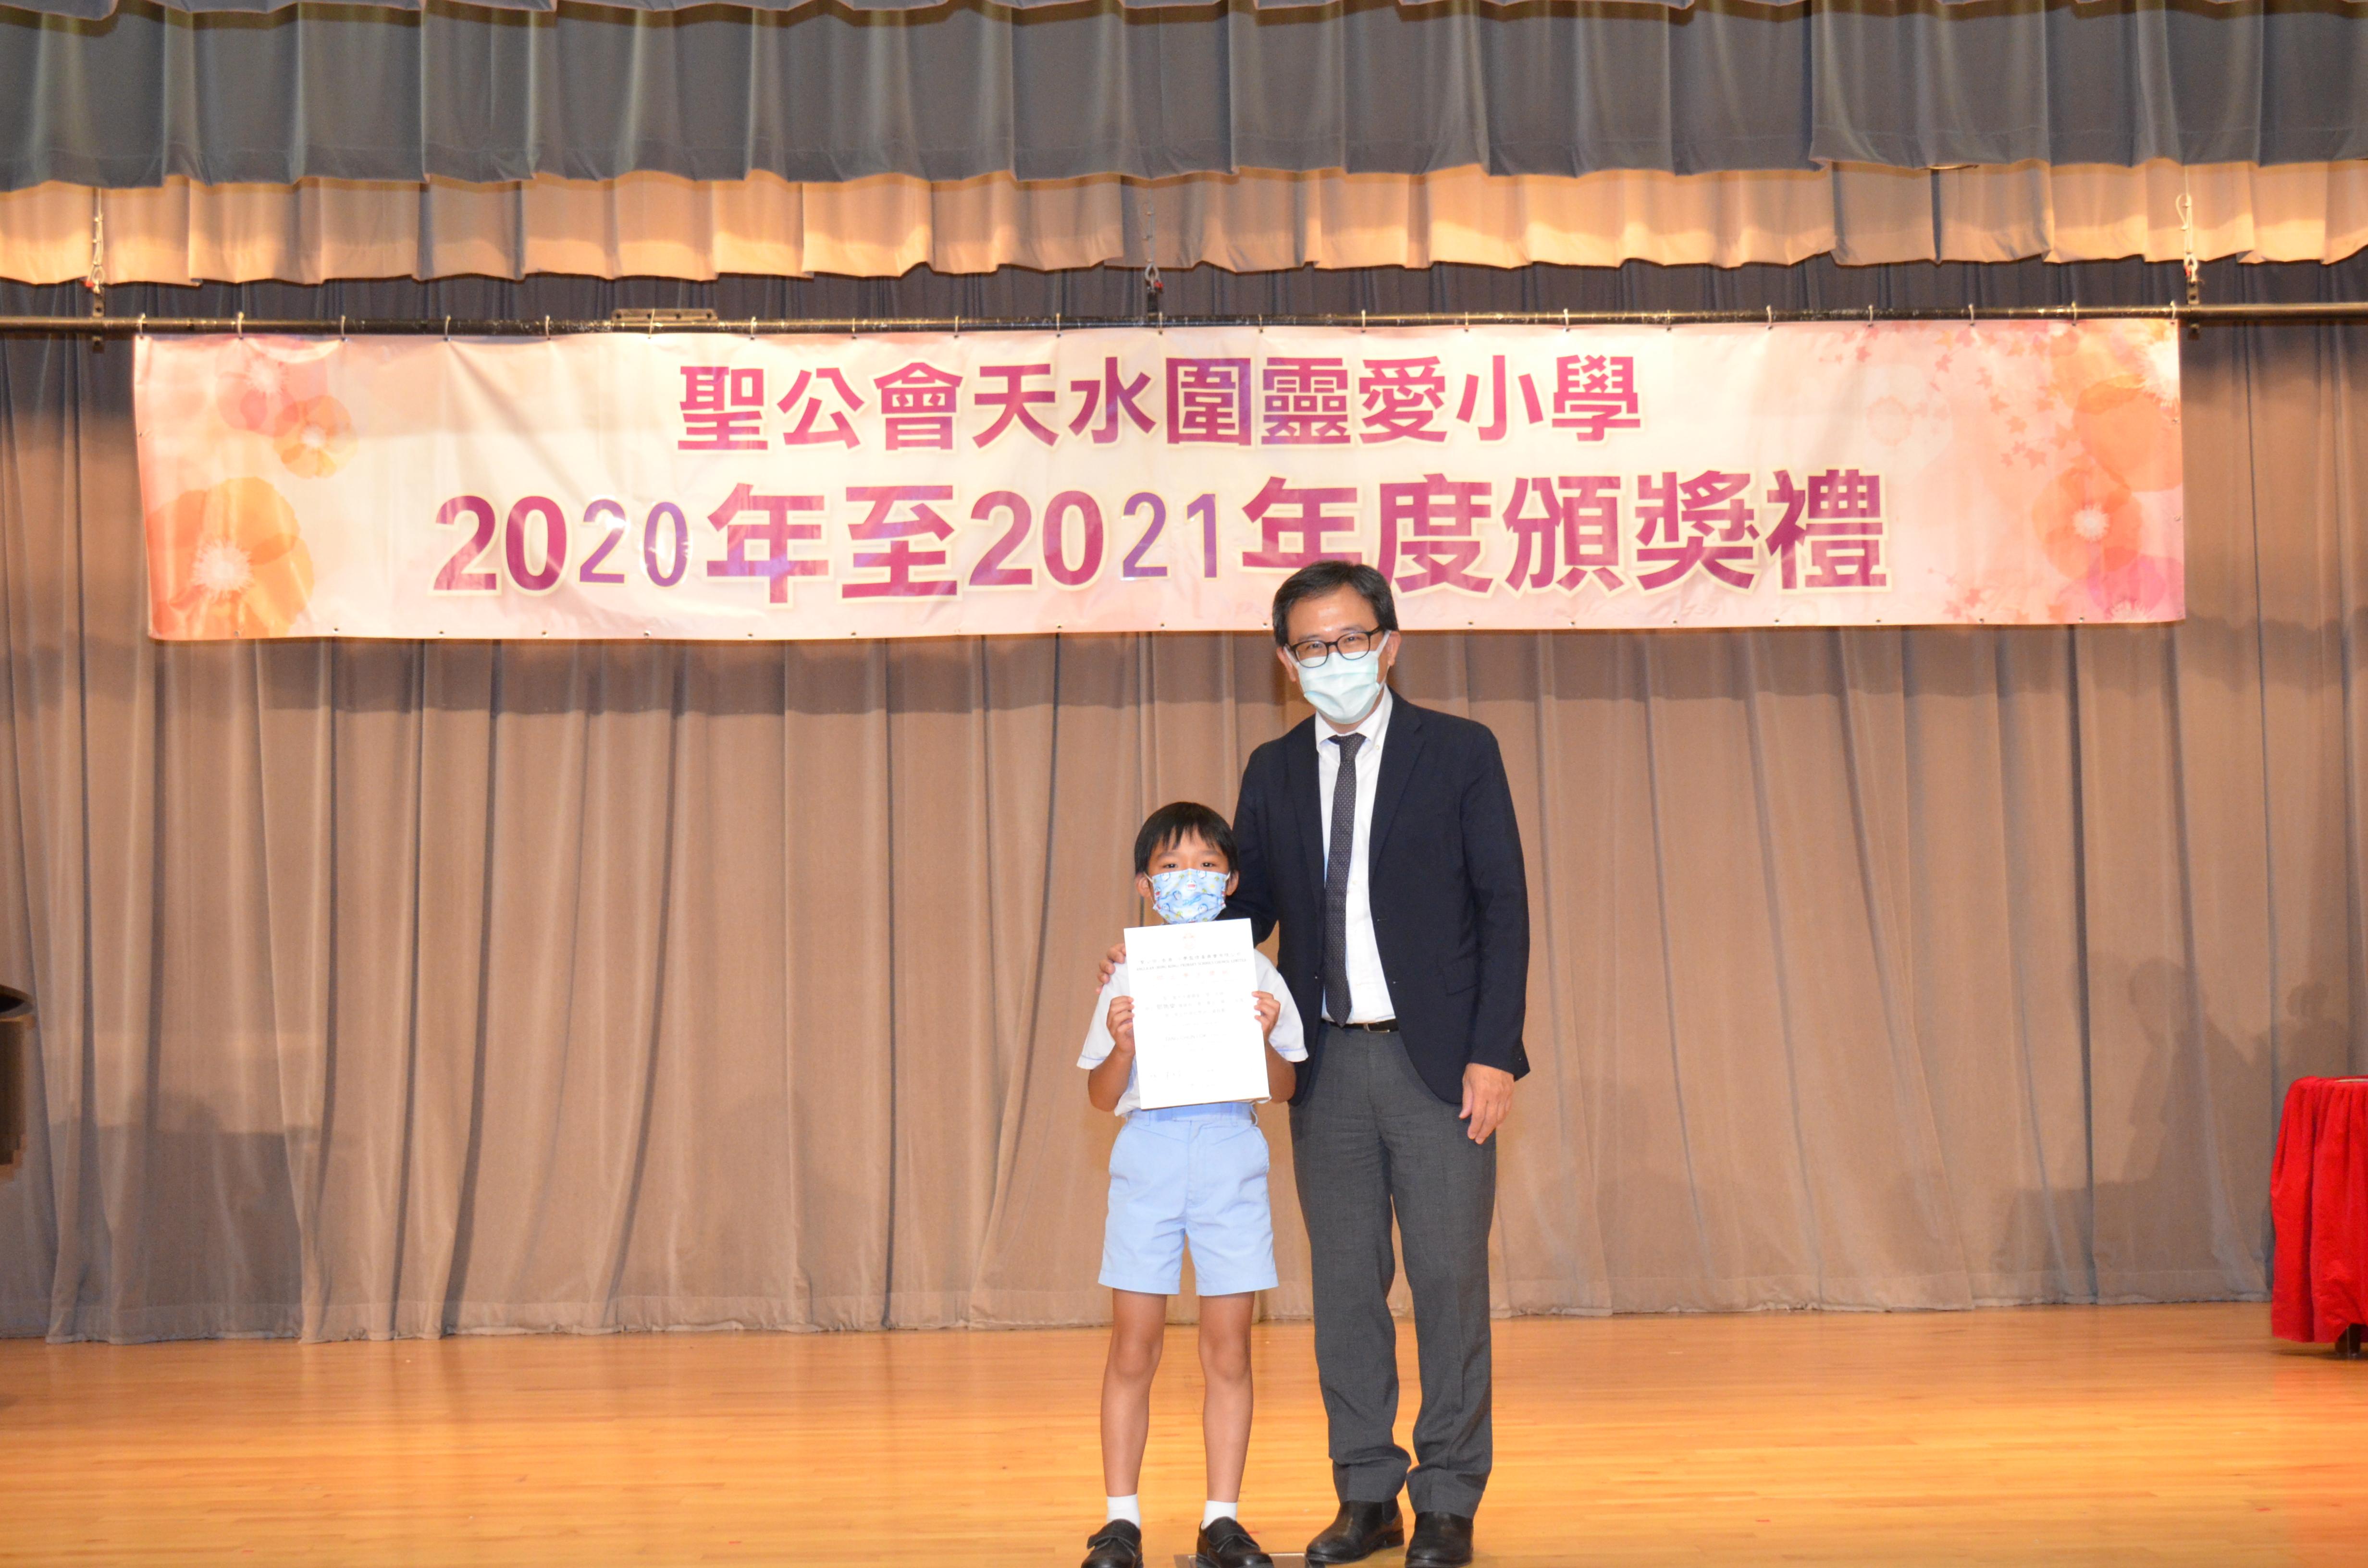 https://skhtswlo.edu.hk/sites/default/files/dsc_3486_1.jpg